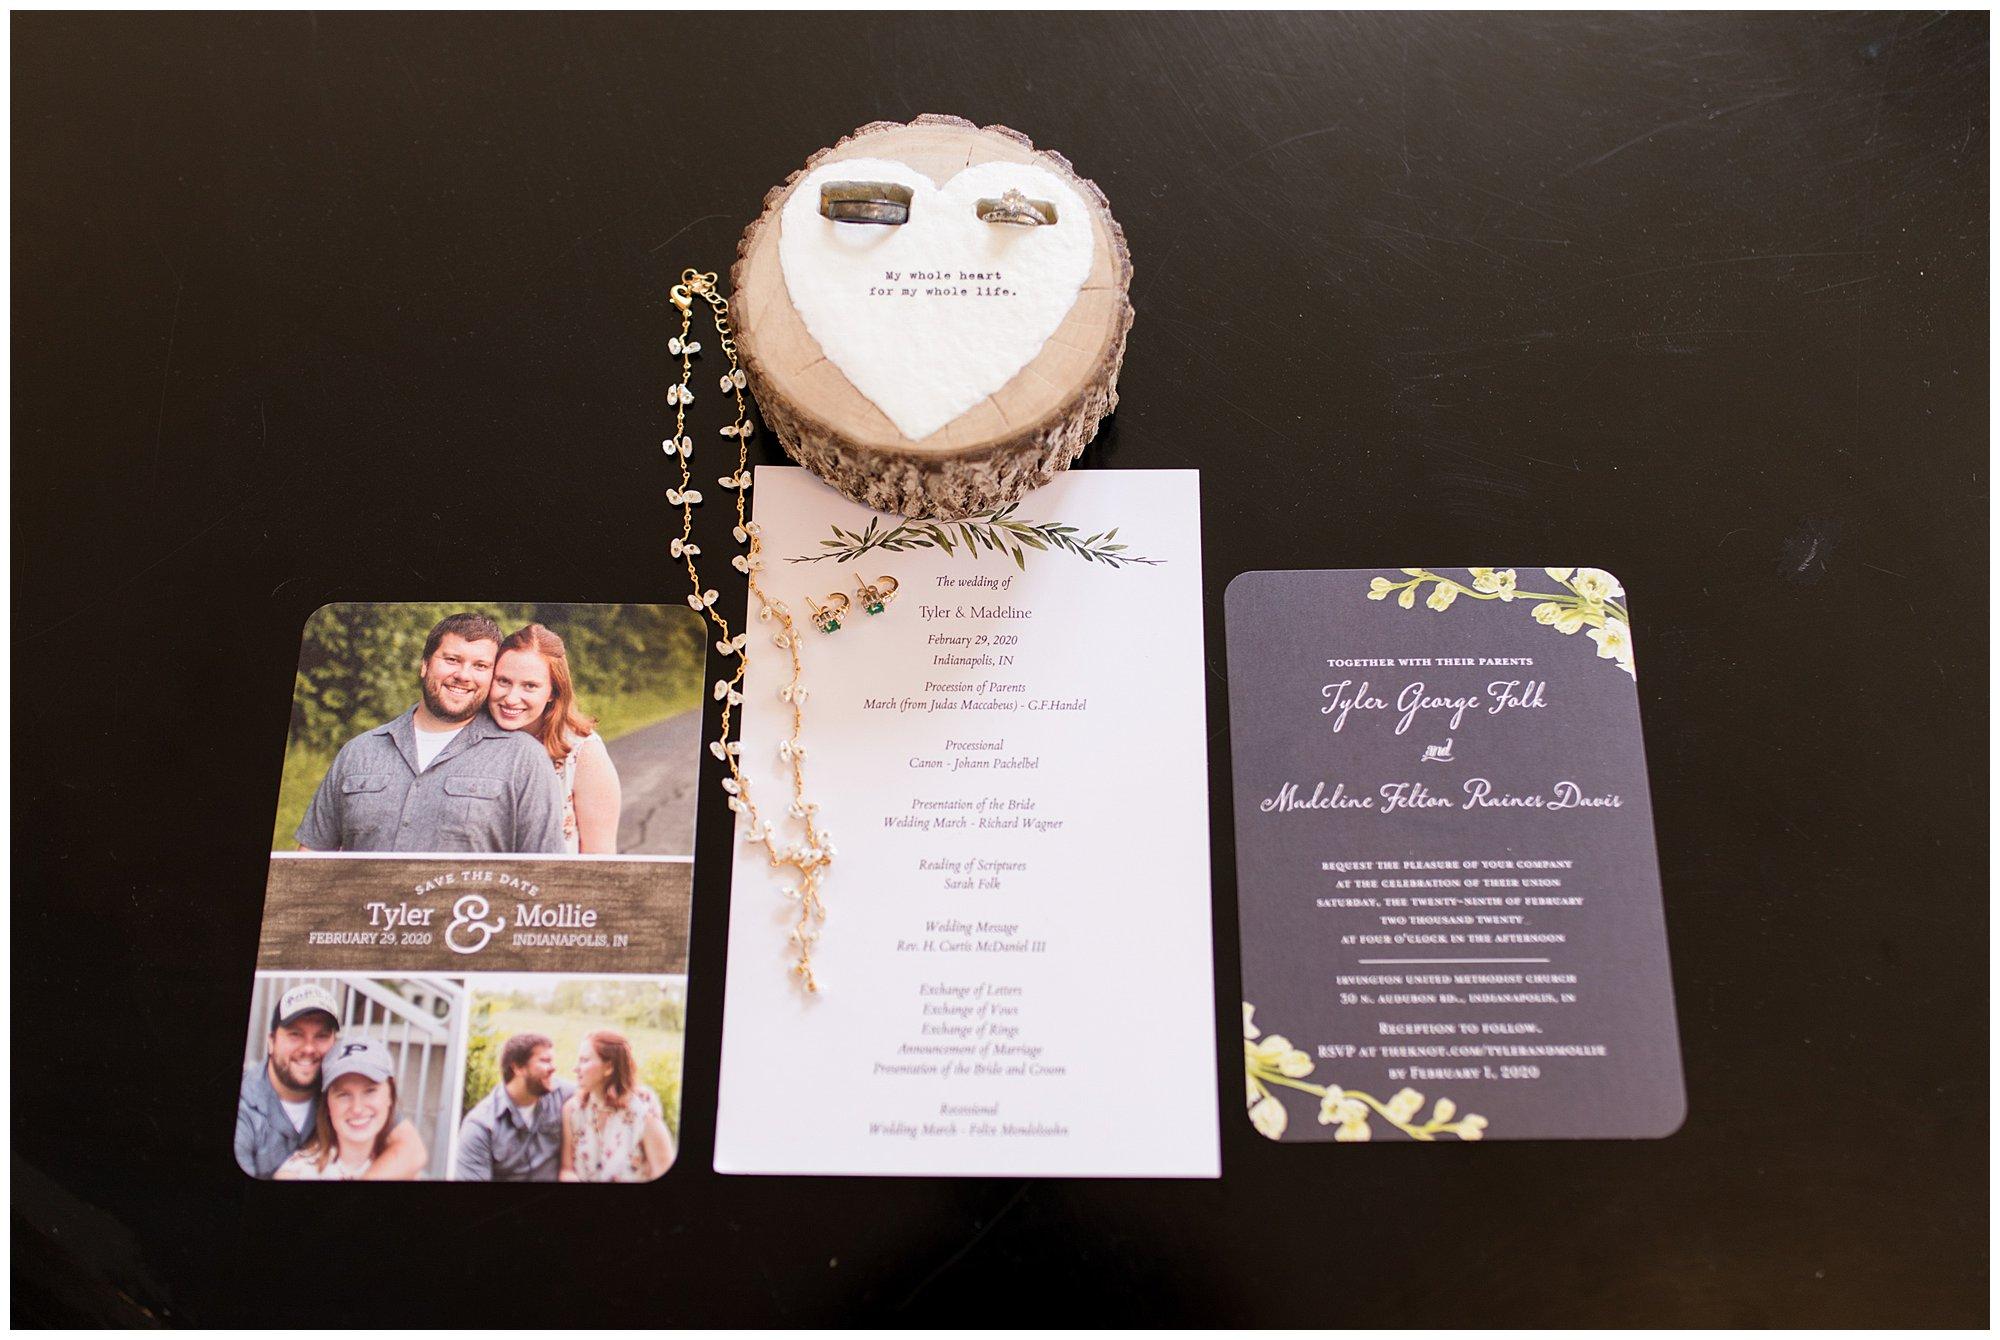 Indianapolis wedding details